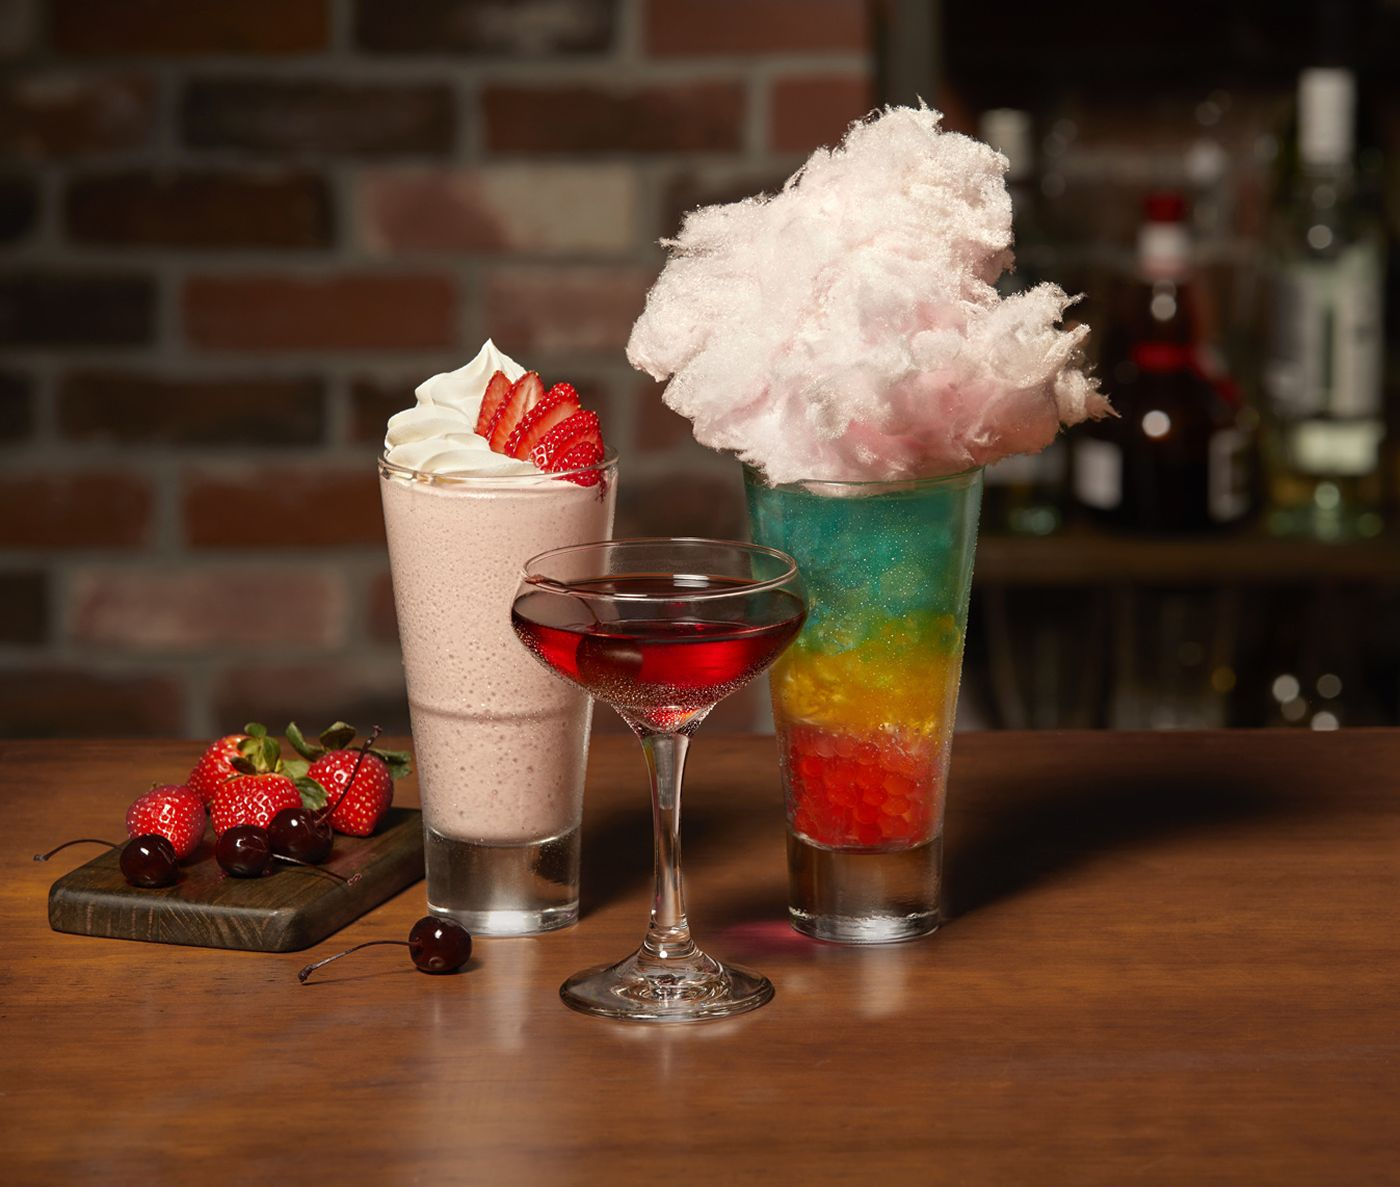 TGI Fridays Handcrafted Drinks: Strawberry Shortcake, Bordeaux Cherry Manhattan, Electric Unicorn